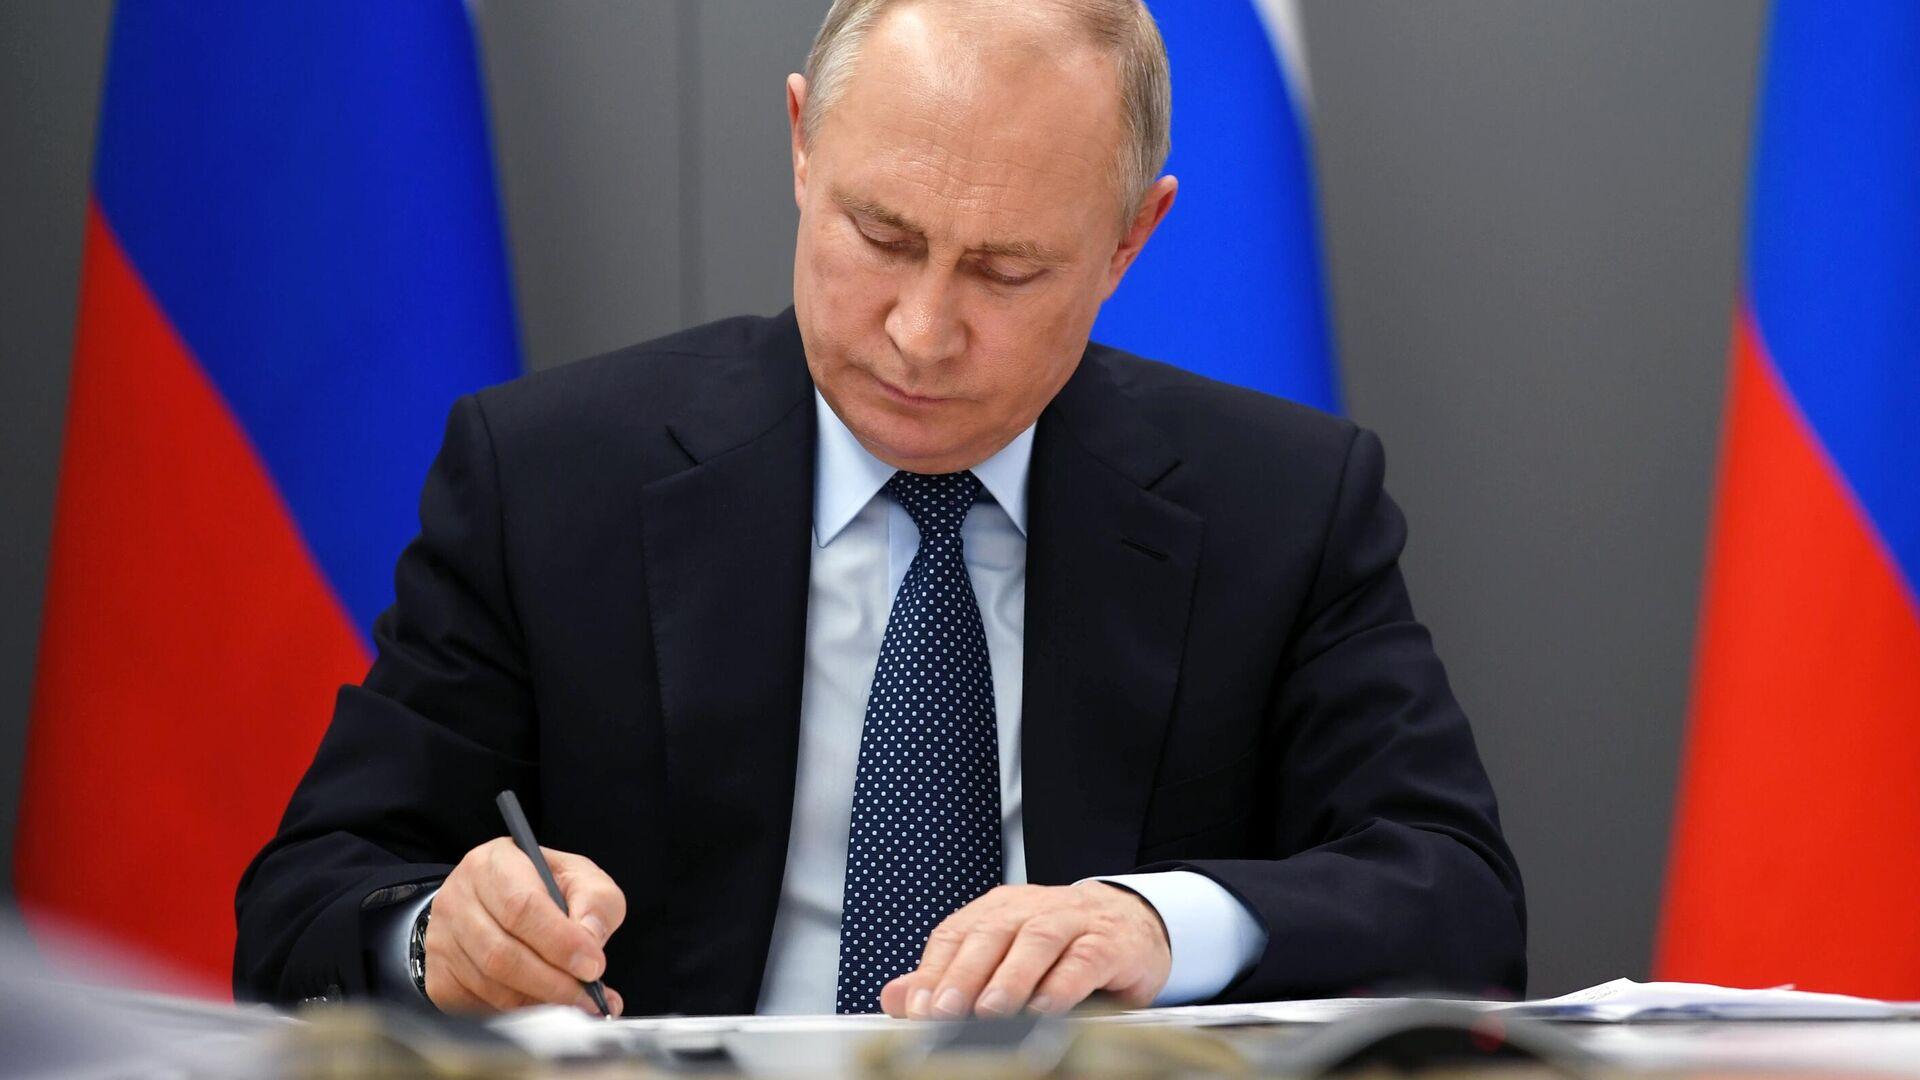 Путин подписал закон о гарантиях неприкосновенности для экс-президента